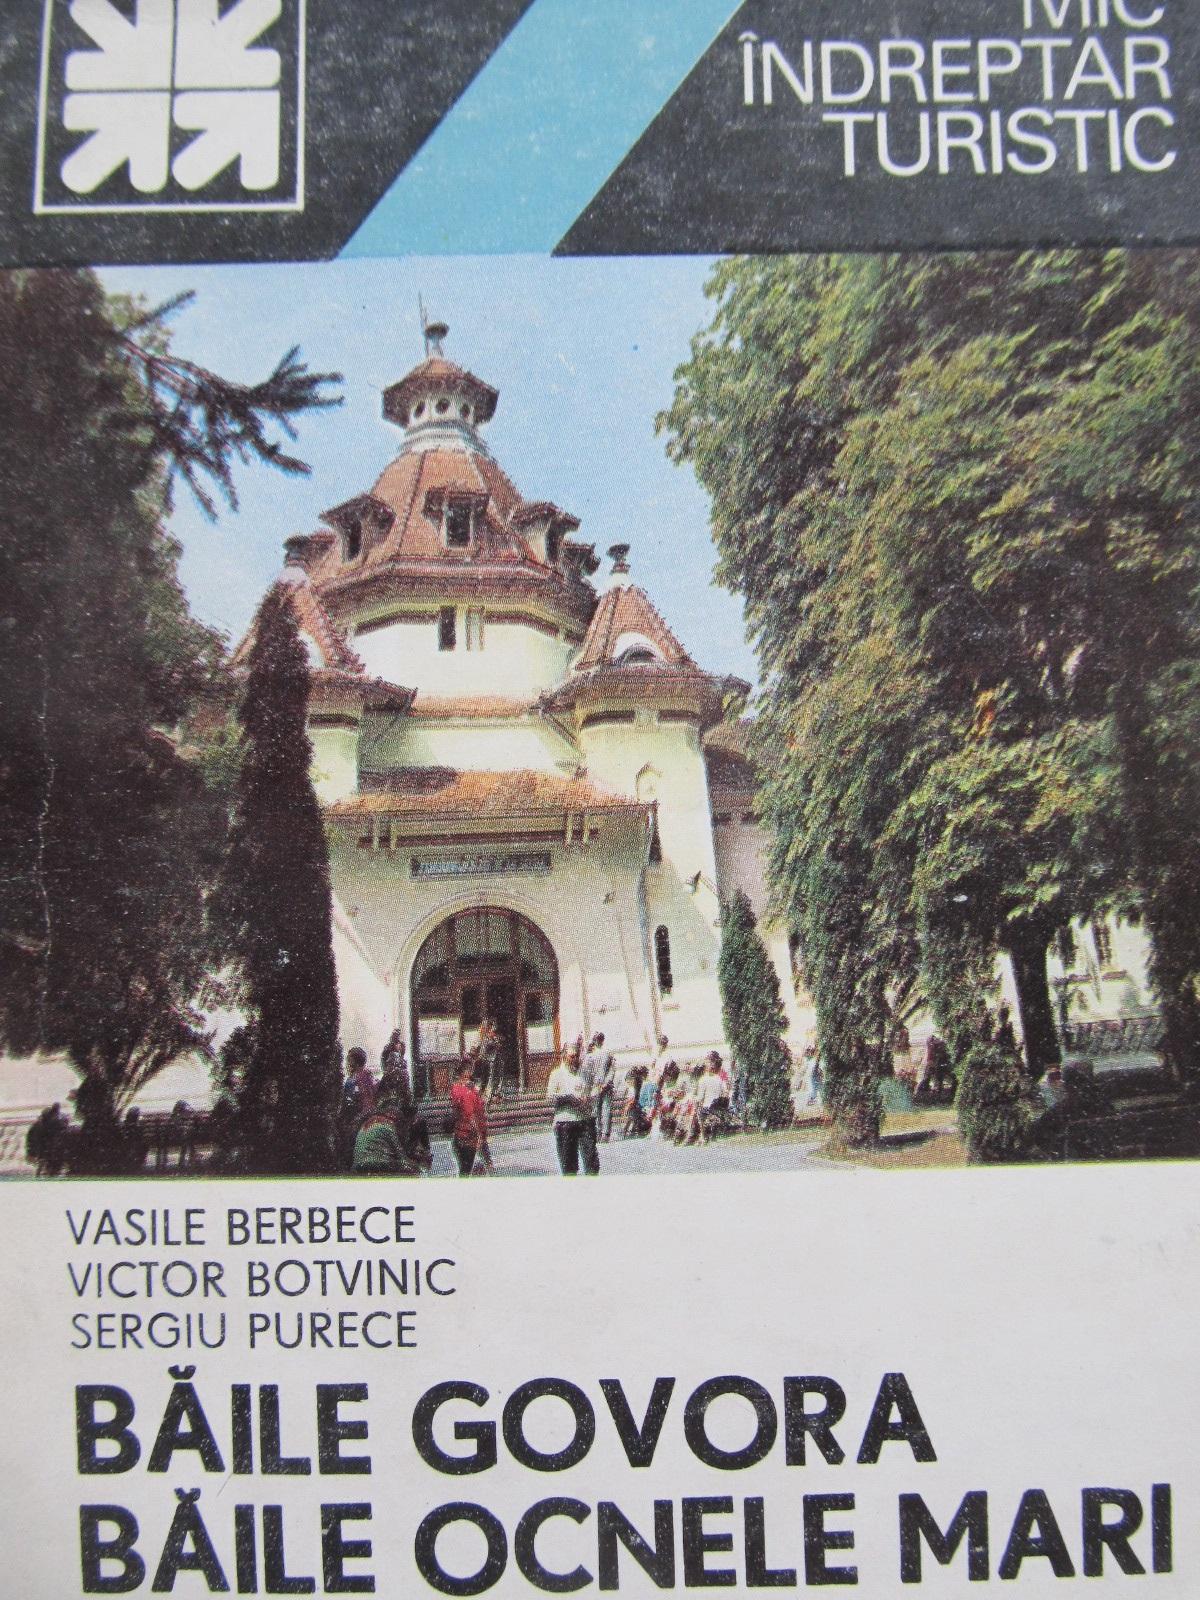 Mic indreptar turistic Baile Govora Baile Ocnele mari (cu harta) - Vasile Berbece , Victor Botvinic , ... | Detalii carte